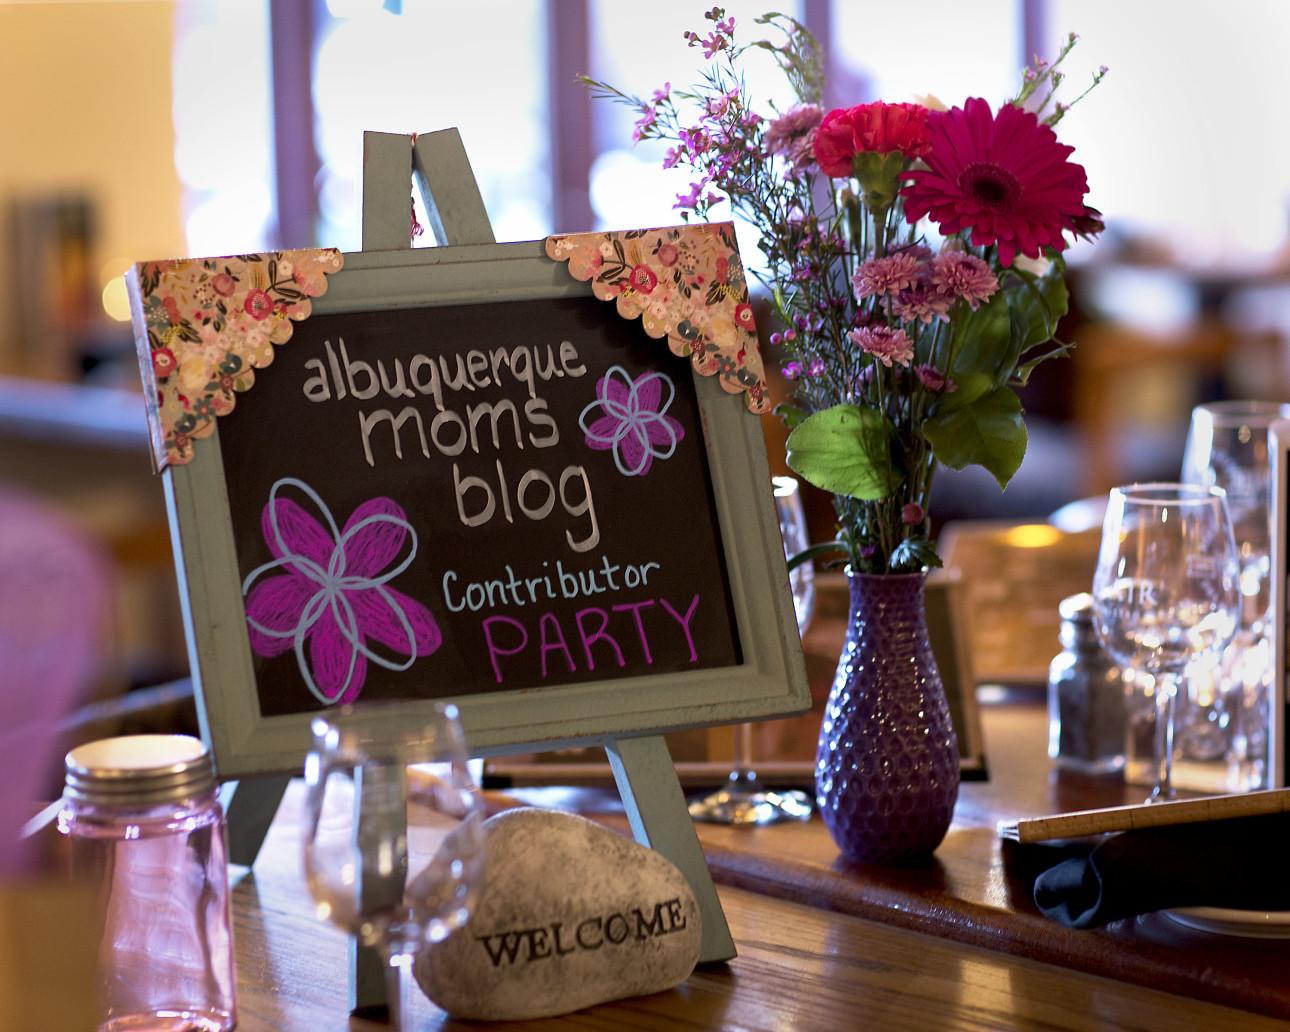 Albuquerque Moms Blog Contributor Party